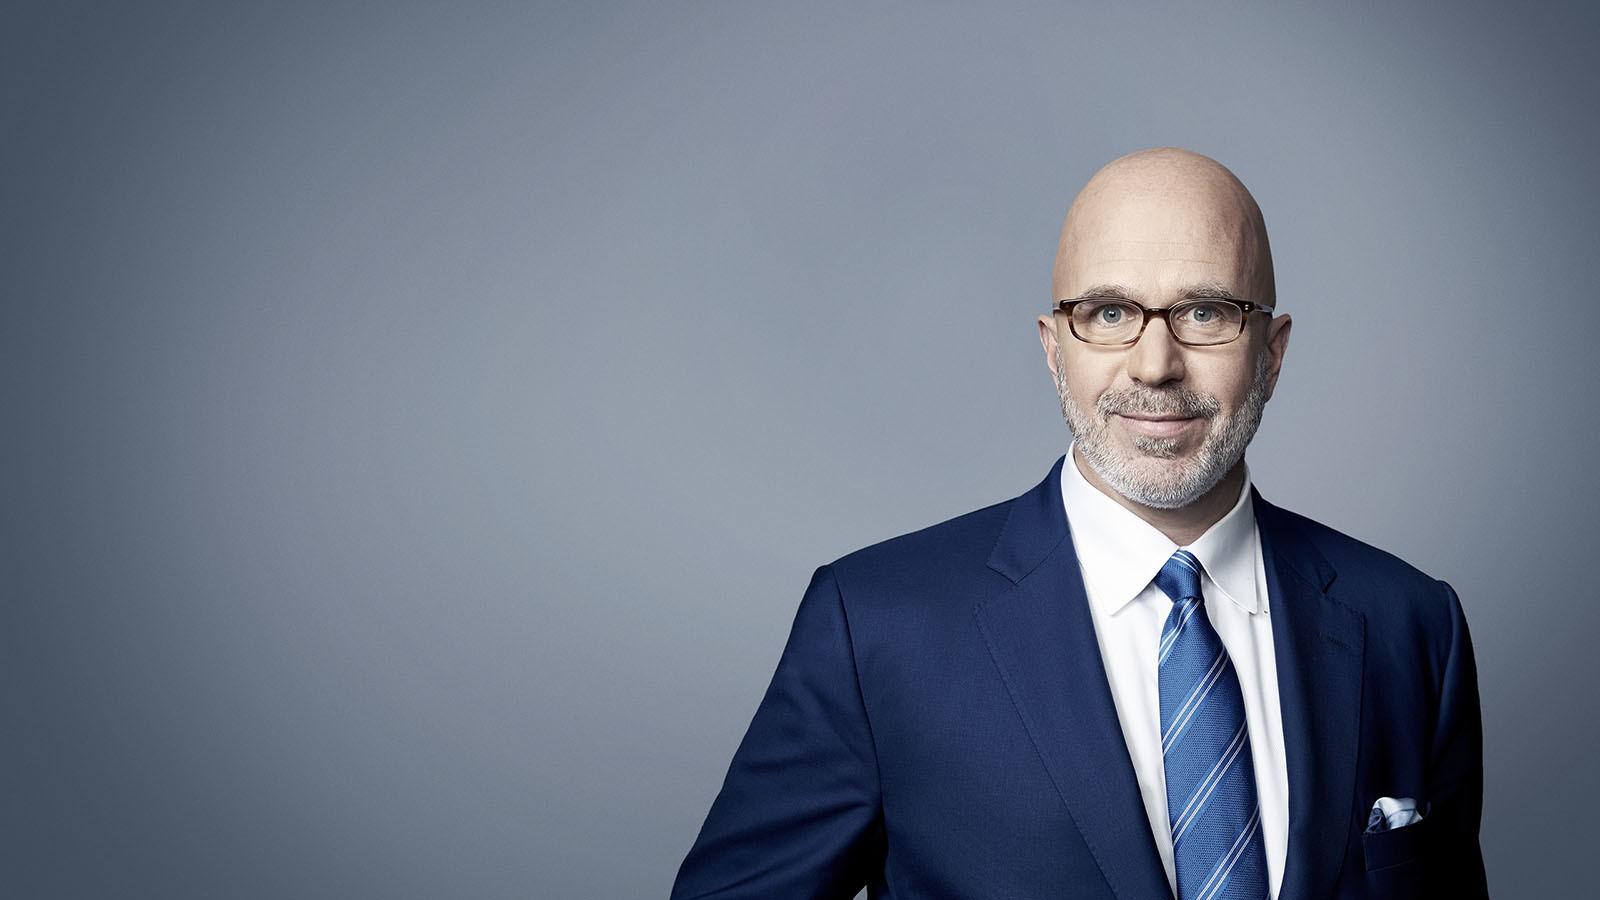 cnn profiles michael smerconish host cnn com